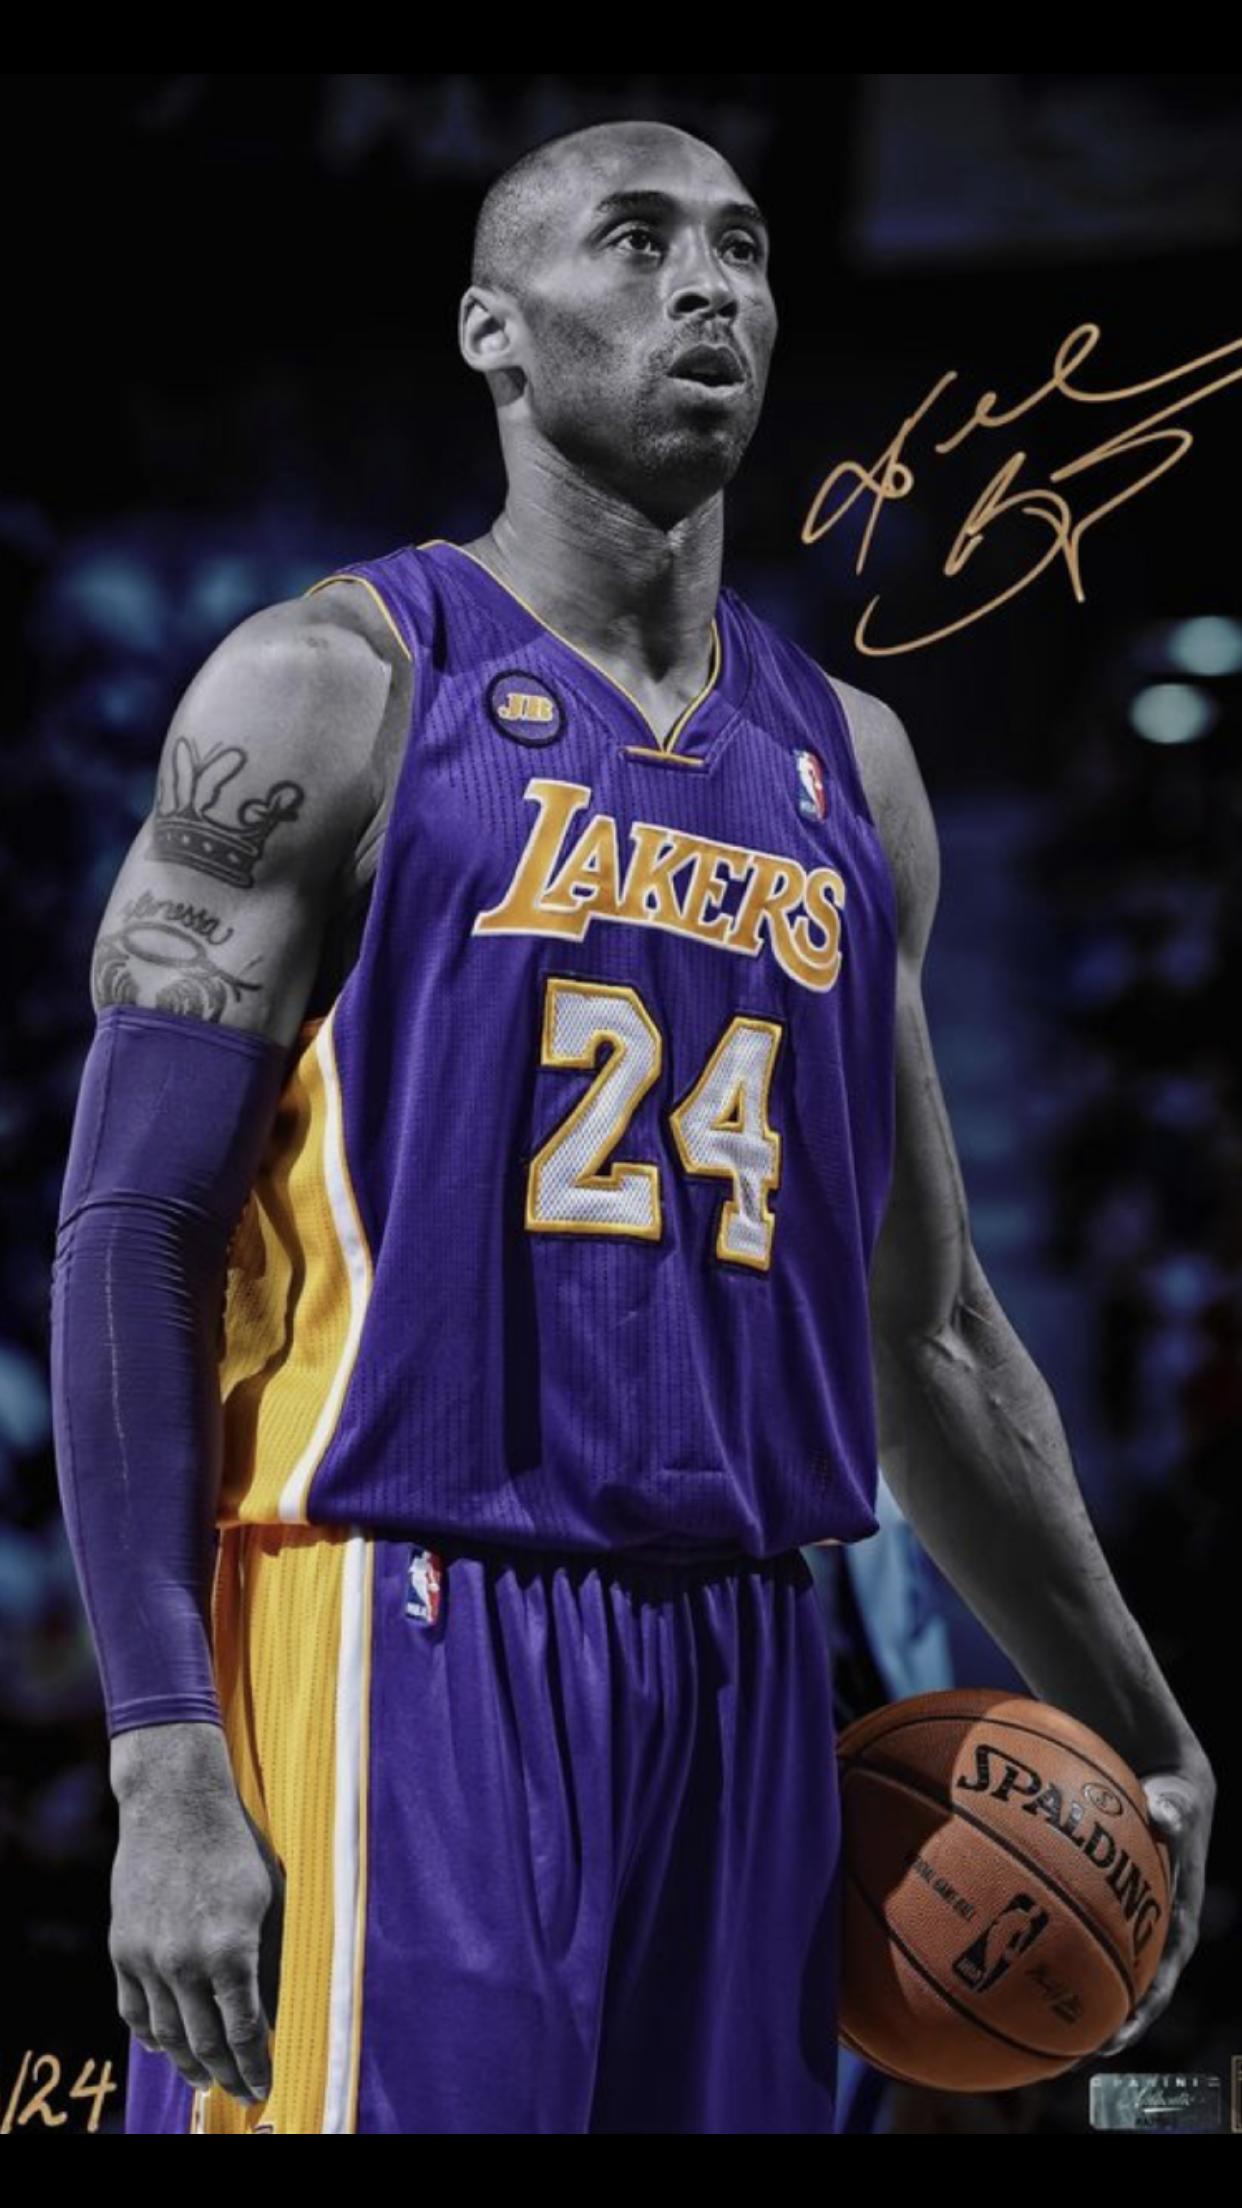 Kobe Bryant Purple Jersey 8 Wallpaper